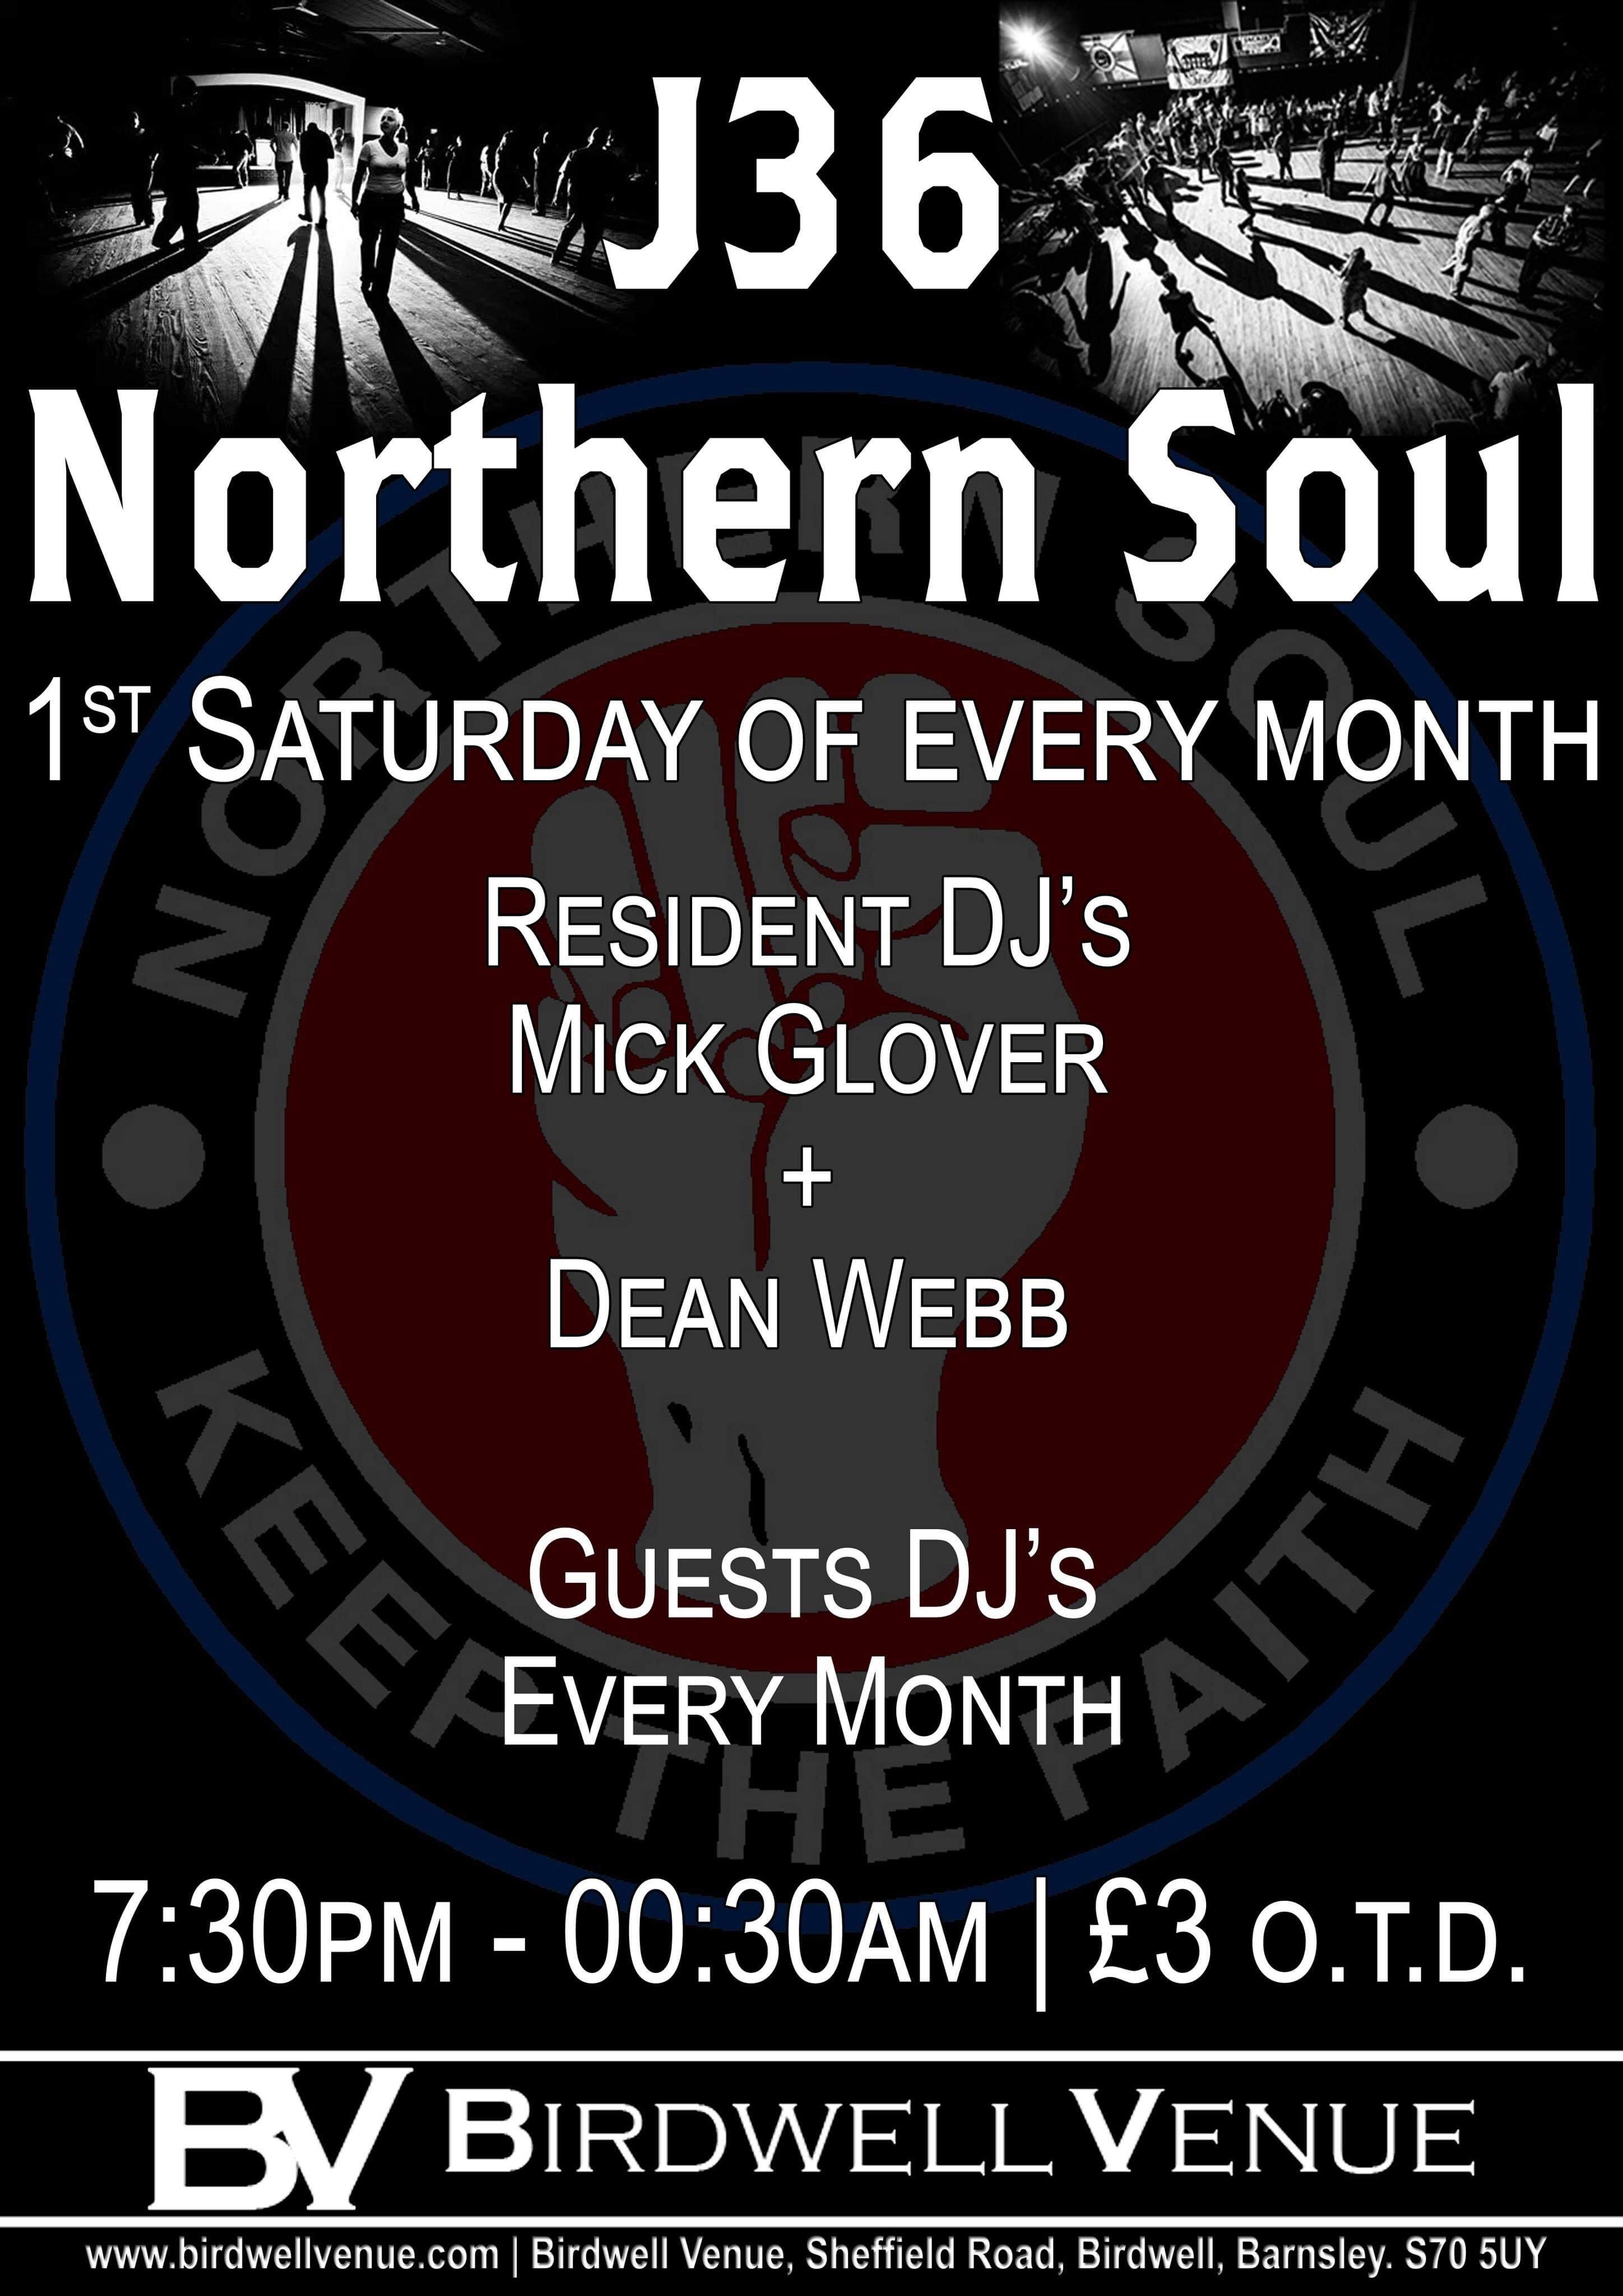 Junction 36 Soul Club Barnsley flyer